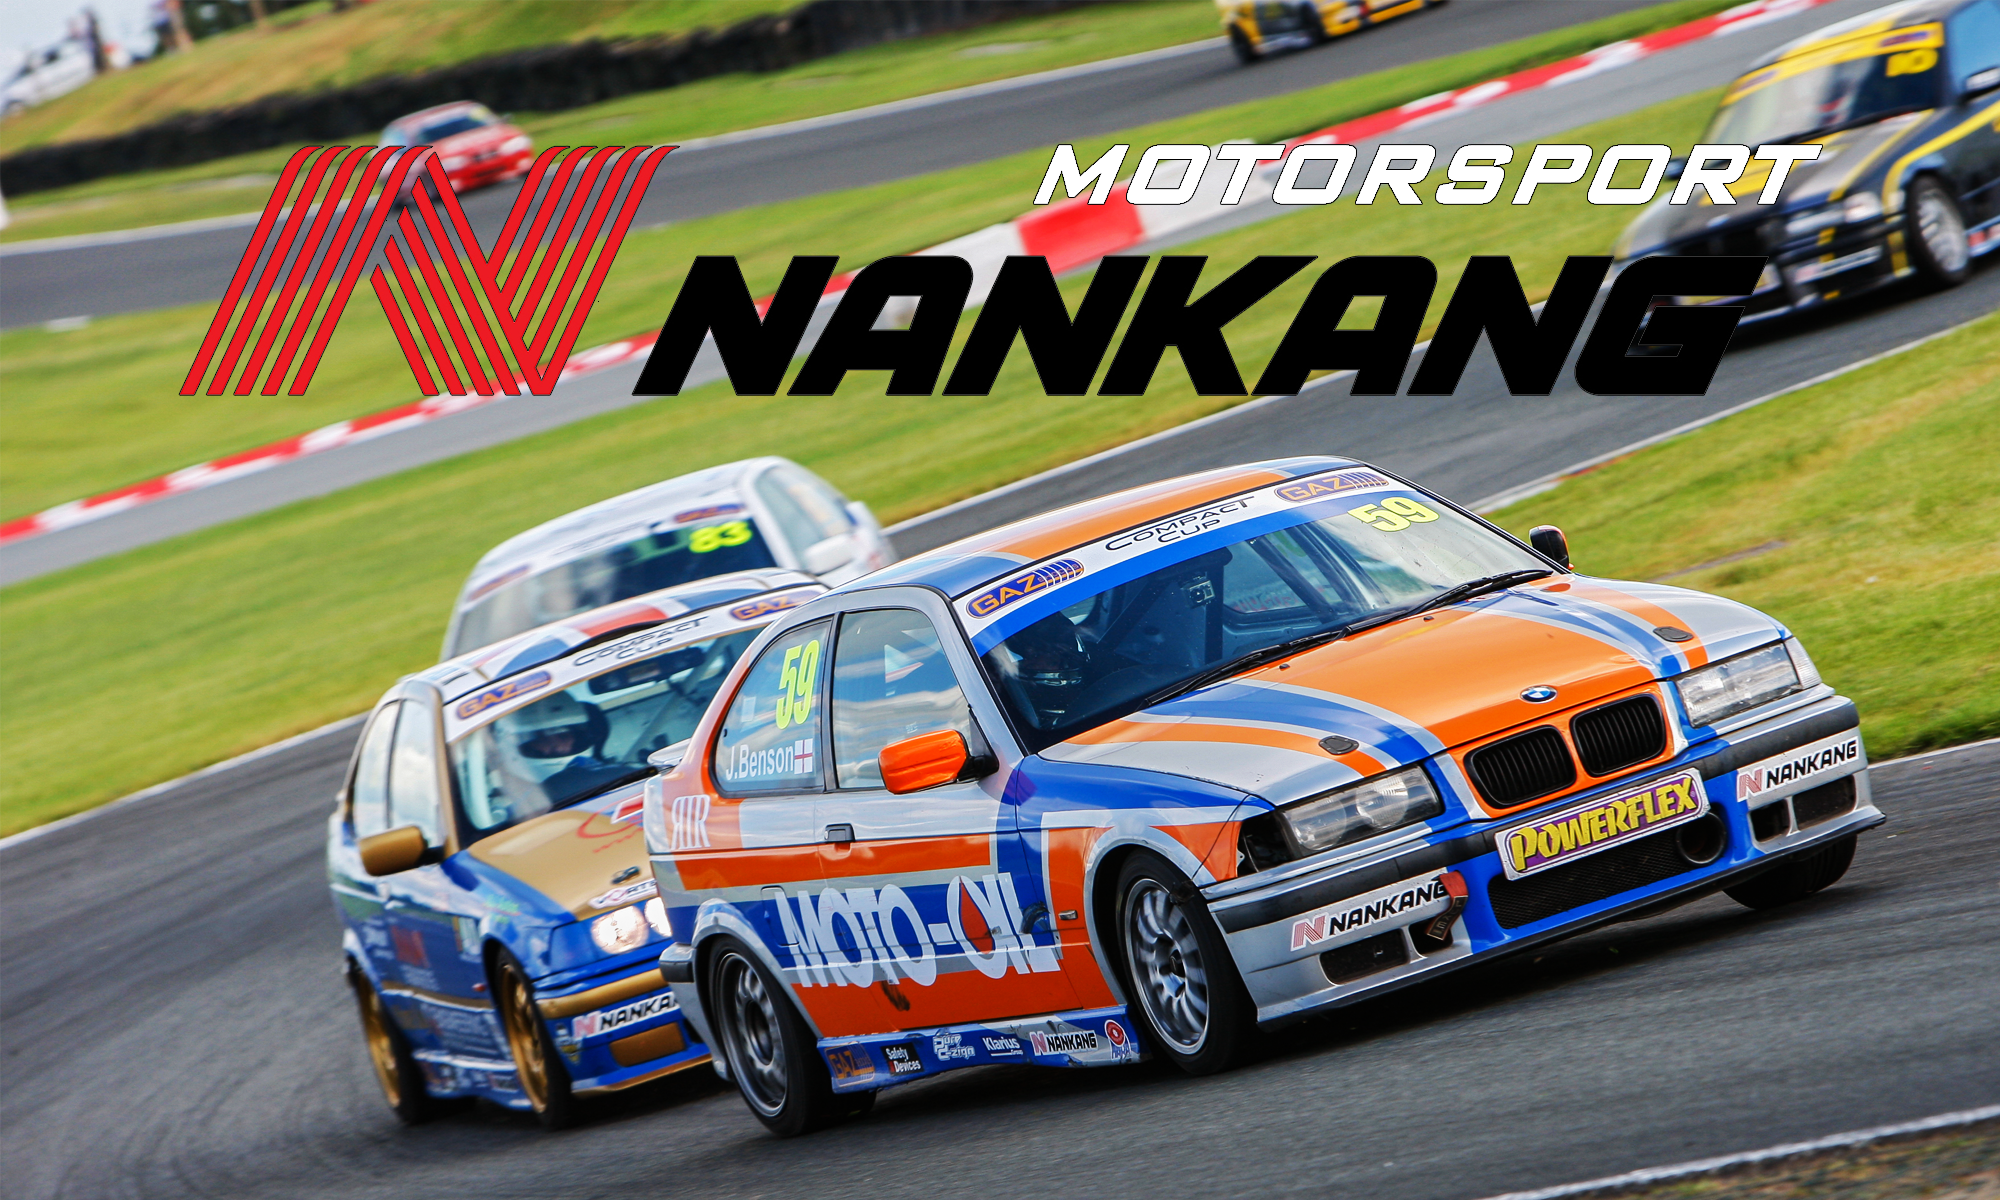 Nankang Racing